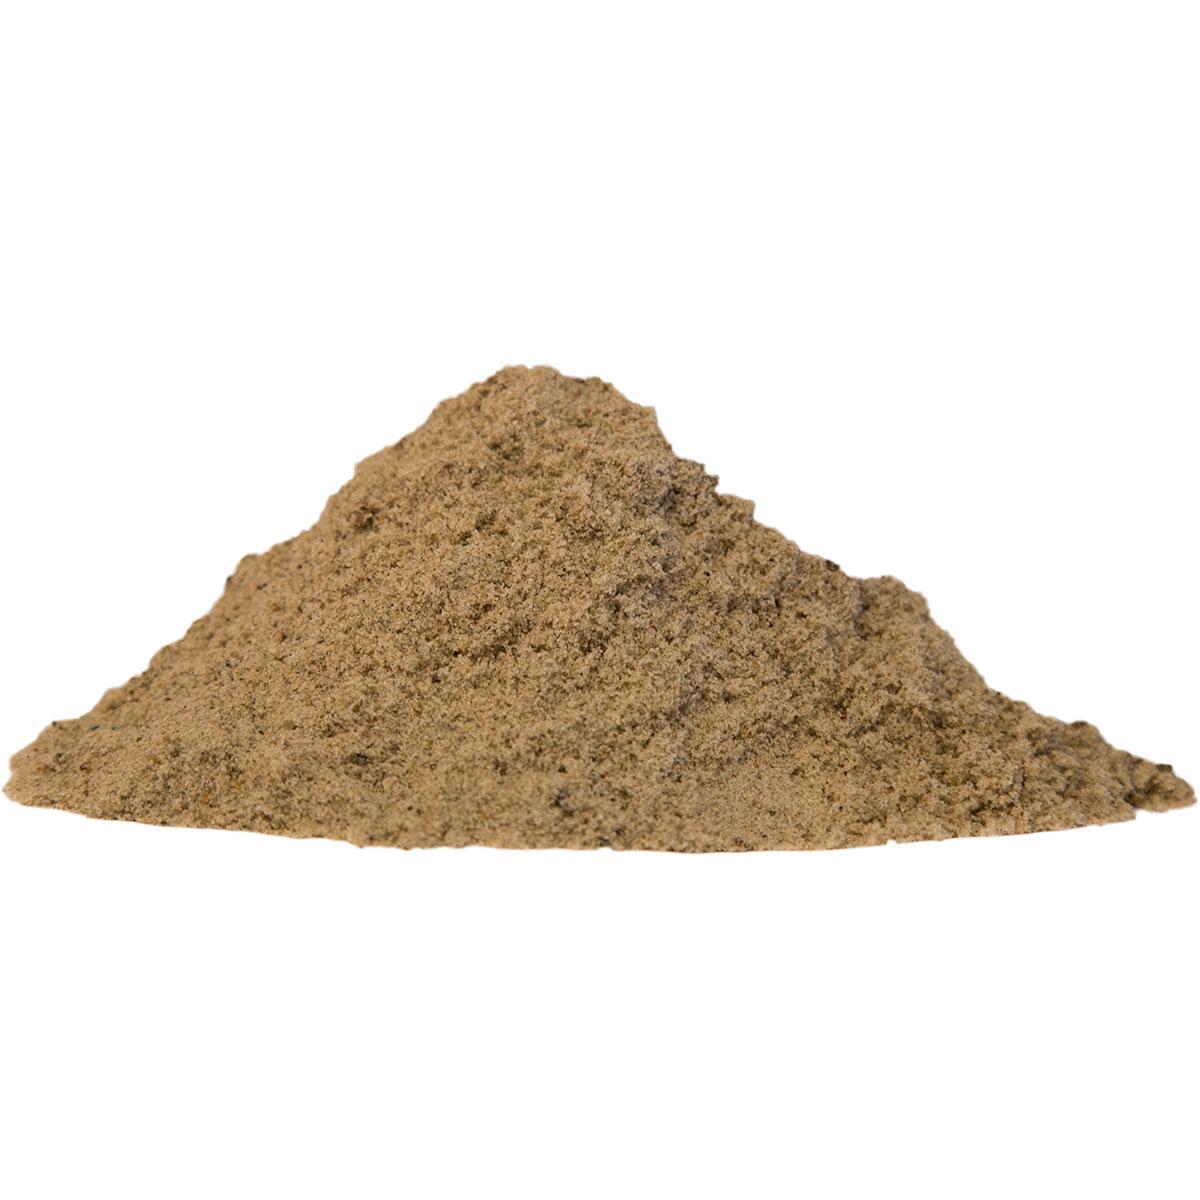 Champost sand - Havsand - 1000 kg